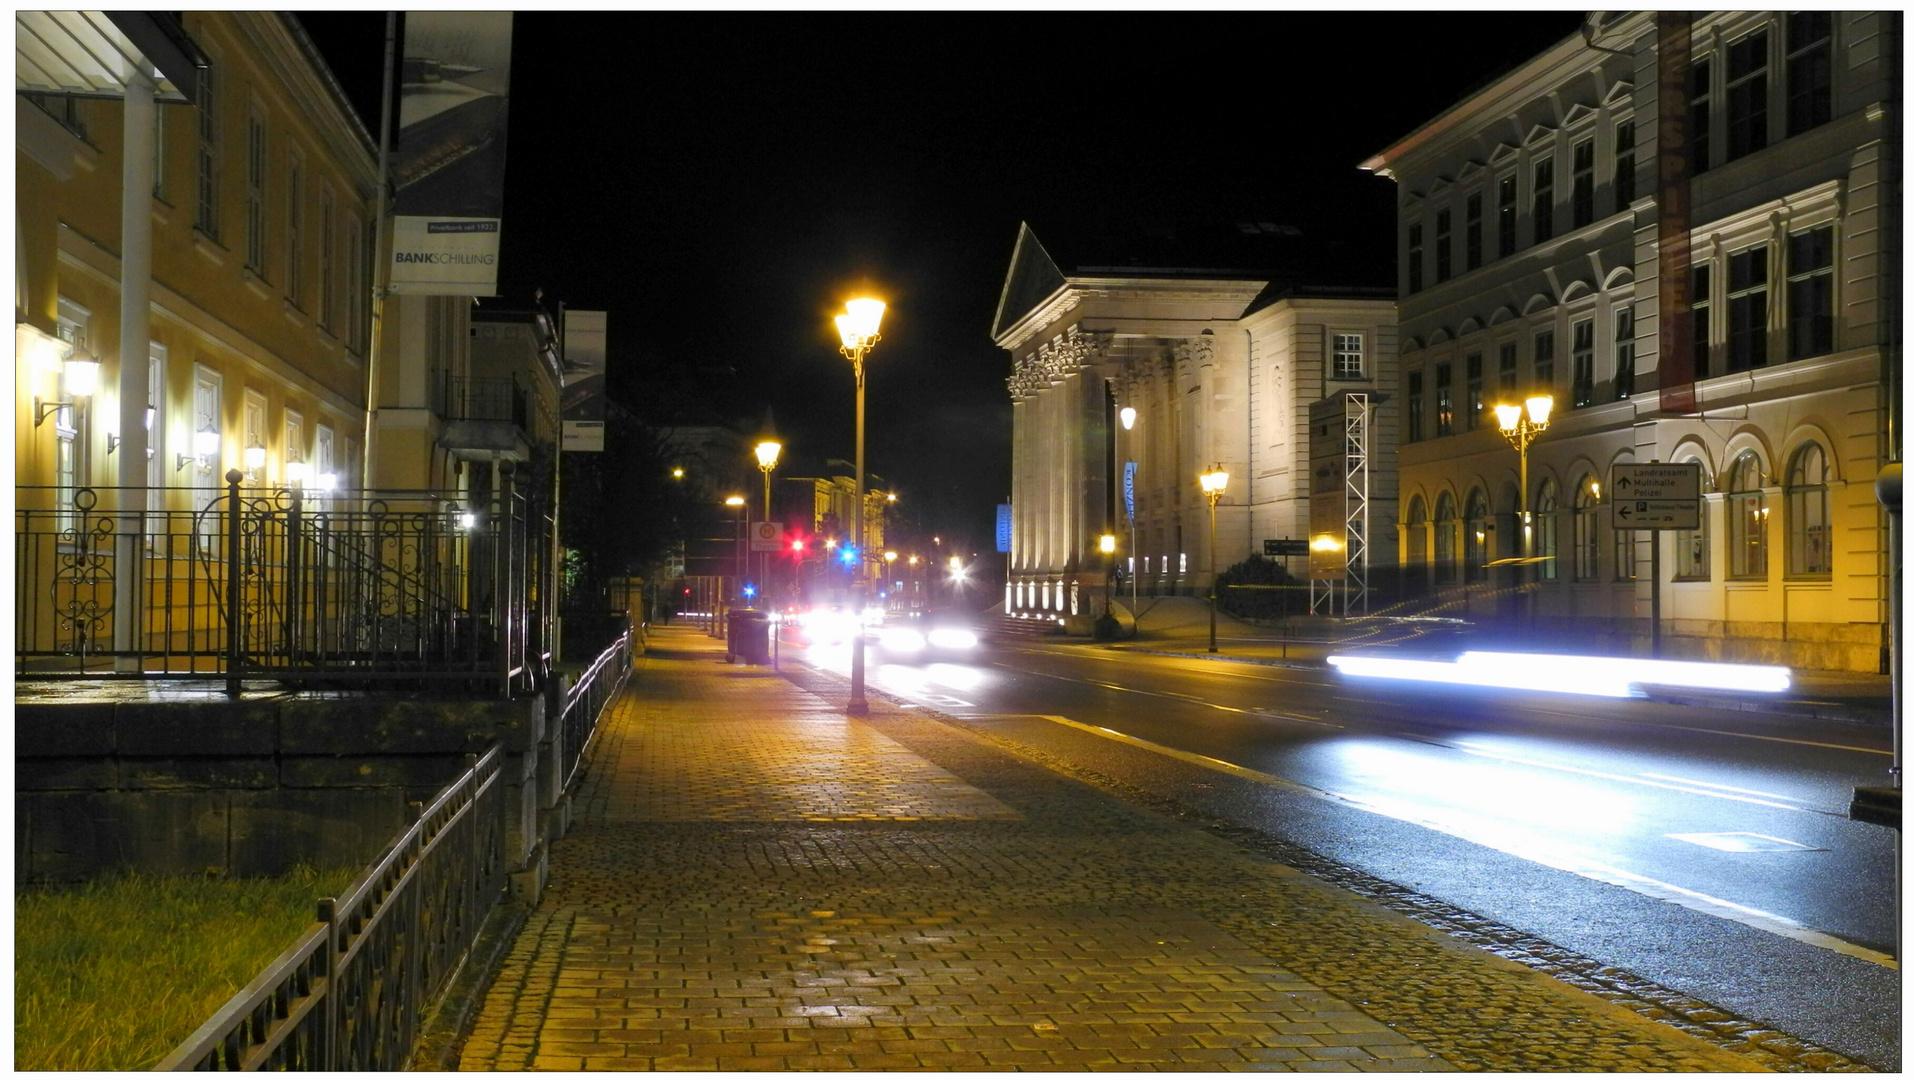 Meiningen, vista al teatro, anoche